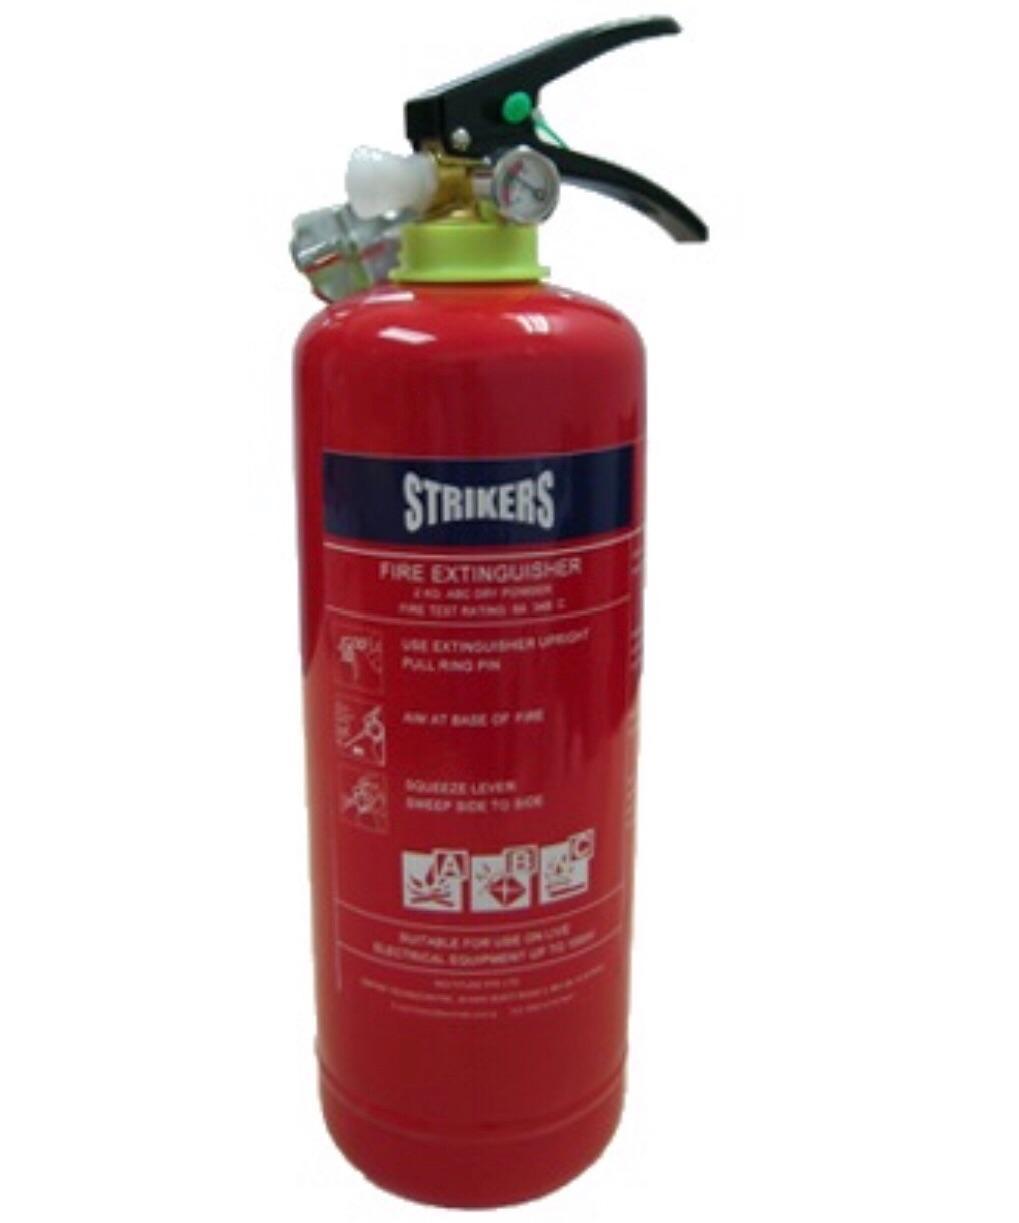 STRIKERS Fire Extinguisher 2KG